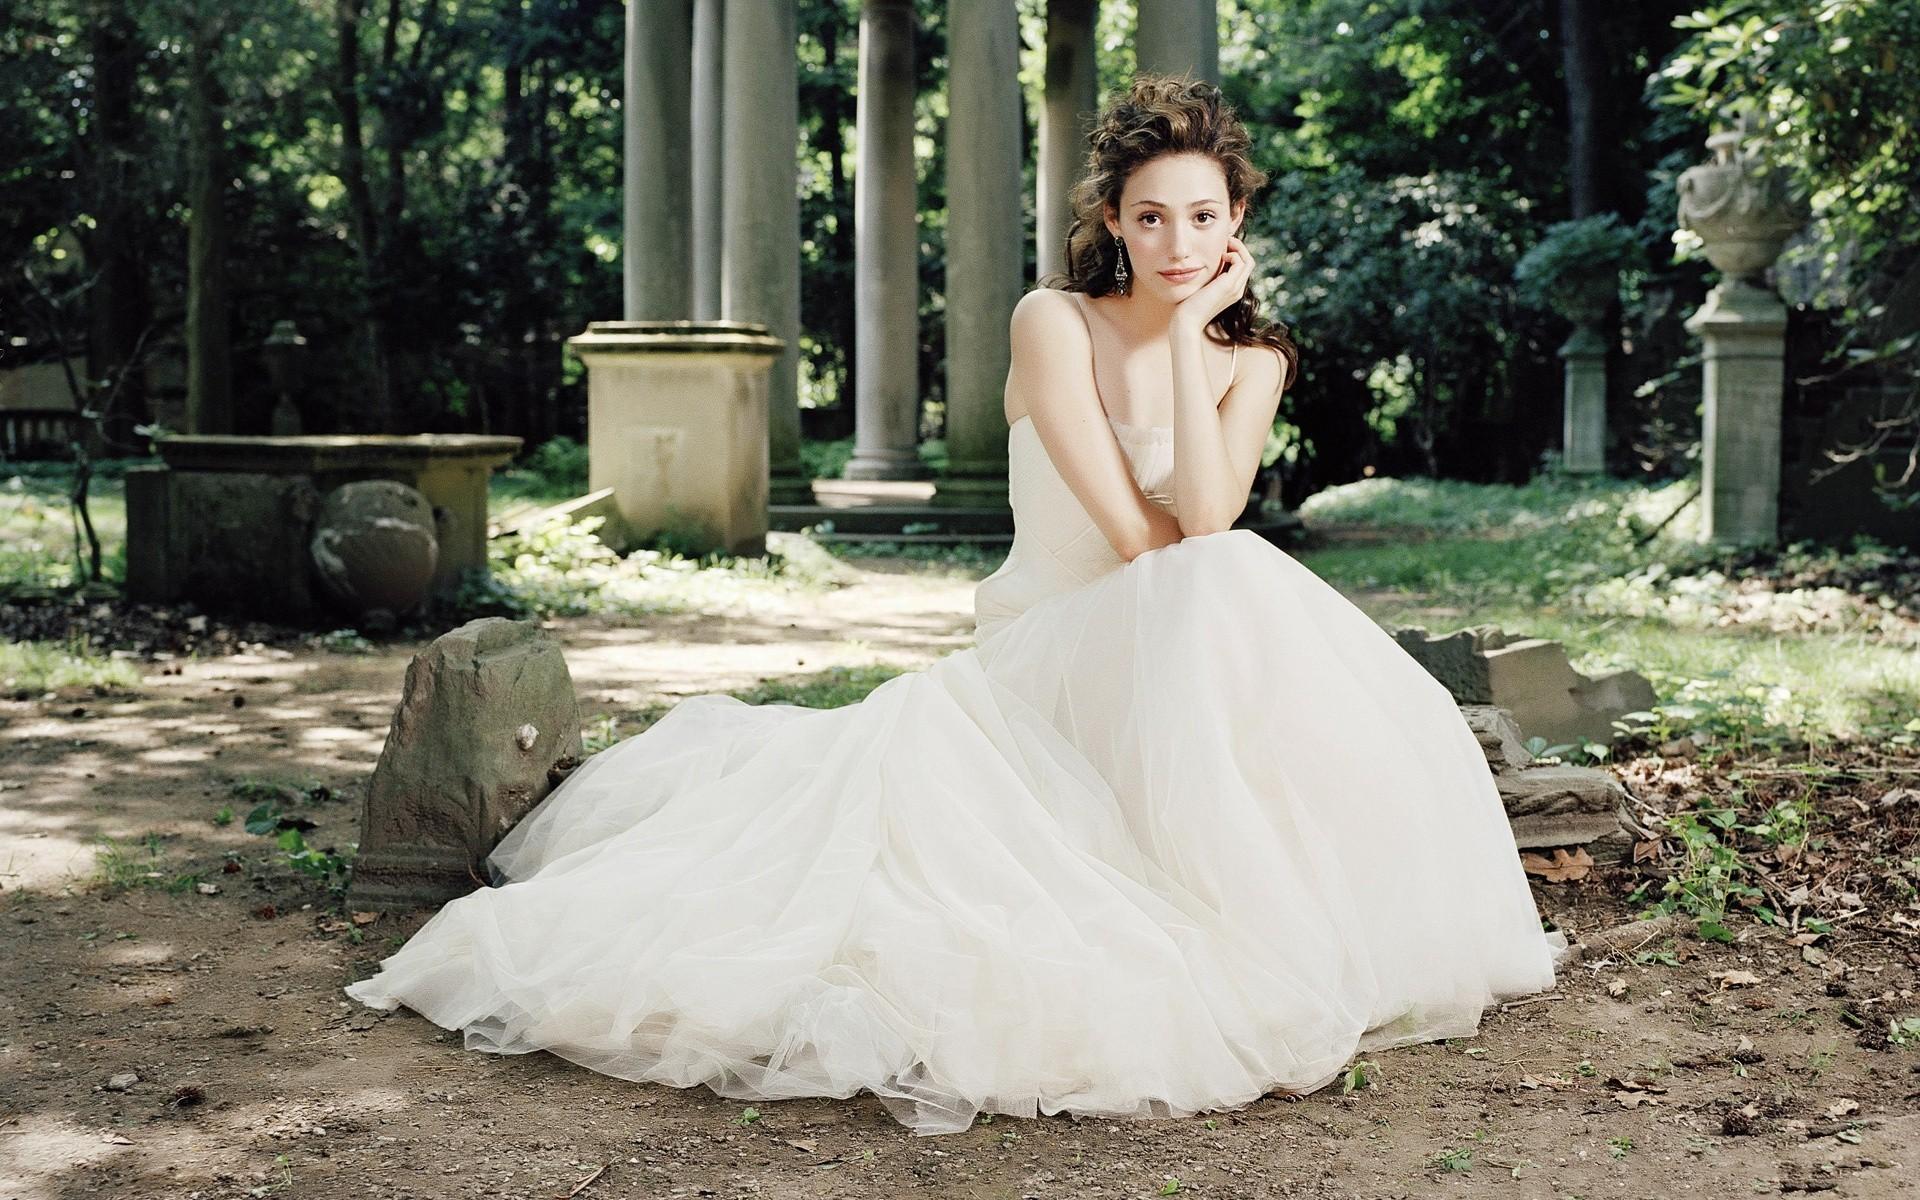 Wedding Dress Wallpaper (66+ images)